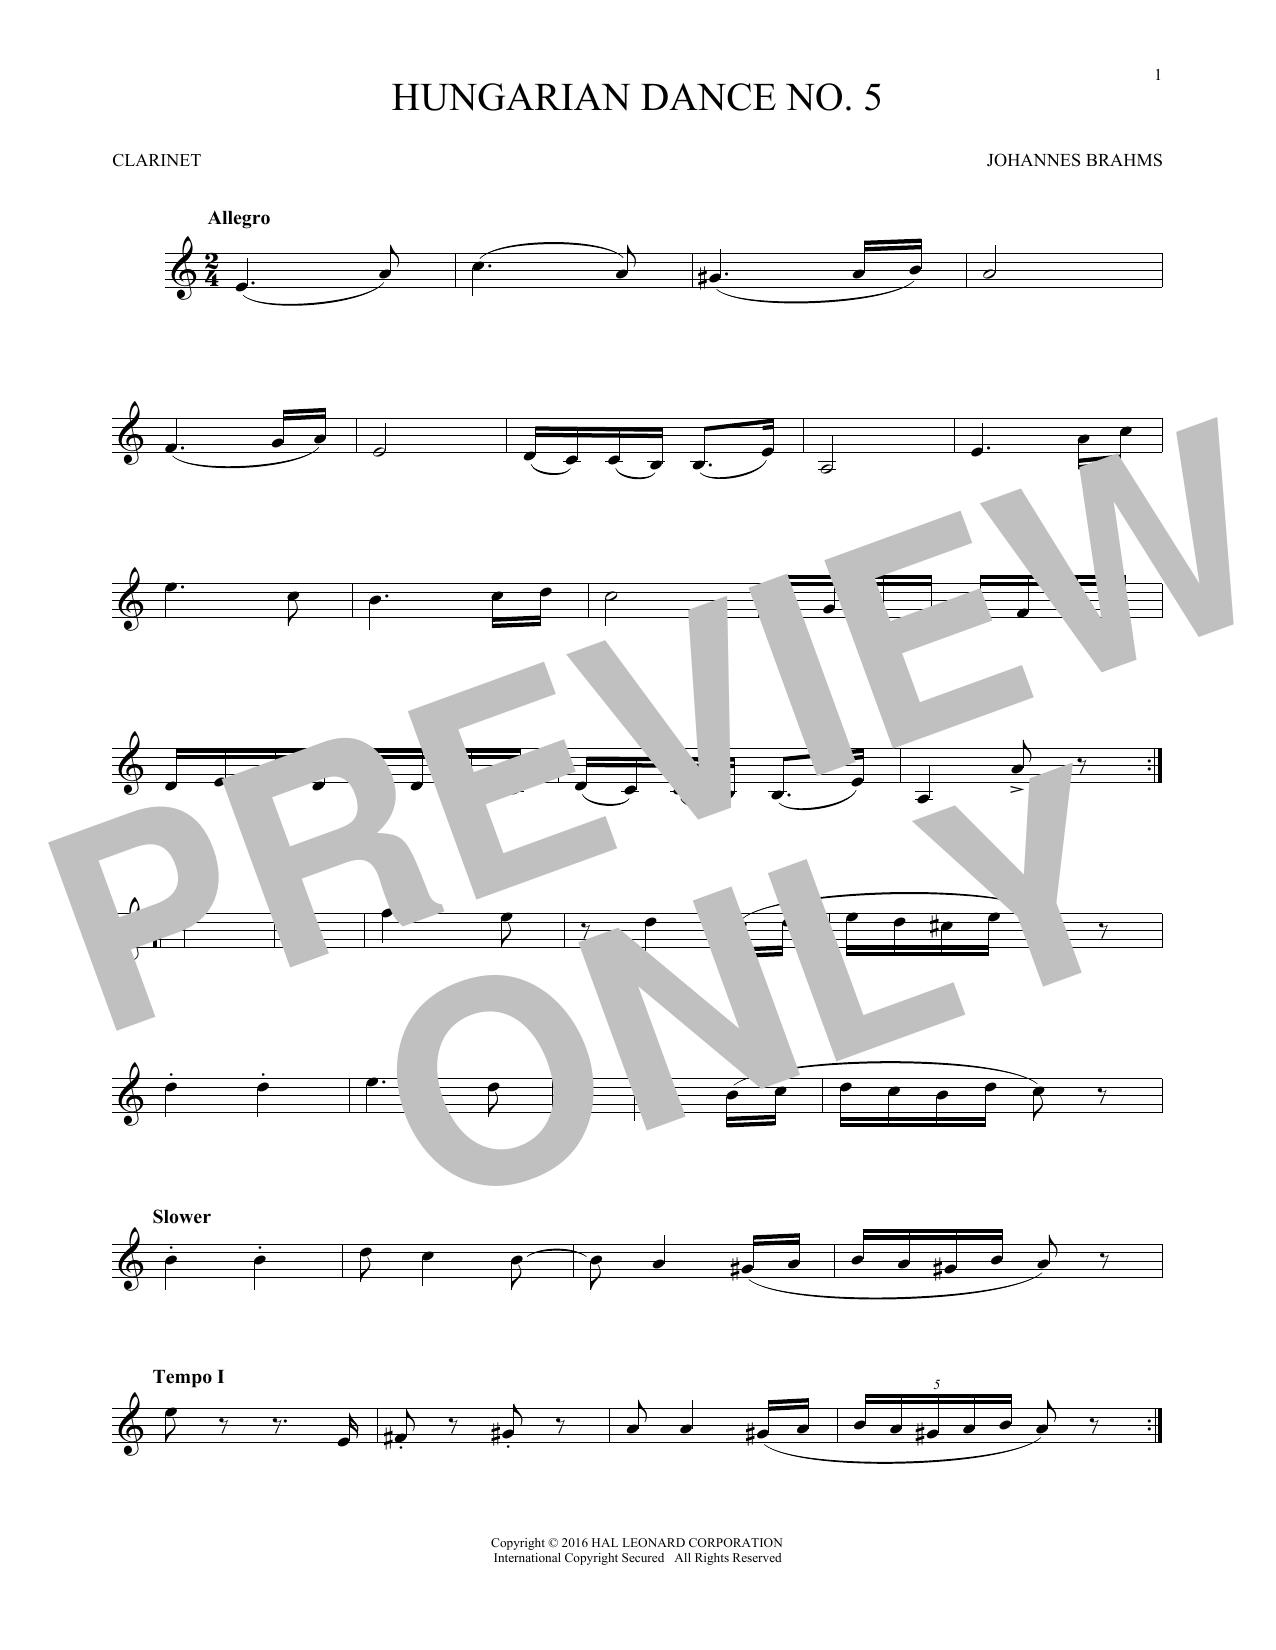 Hungarian Dance No. 5 (Clarinet Solo)